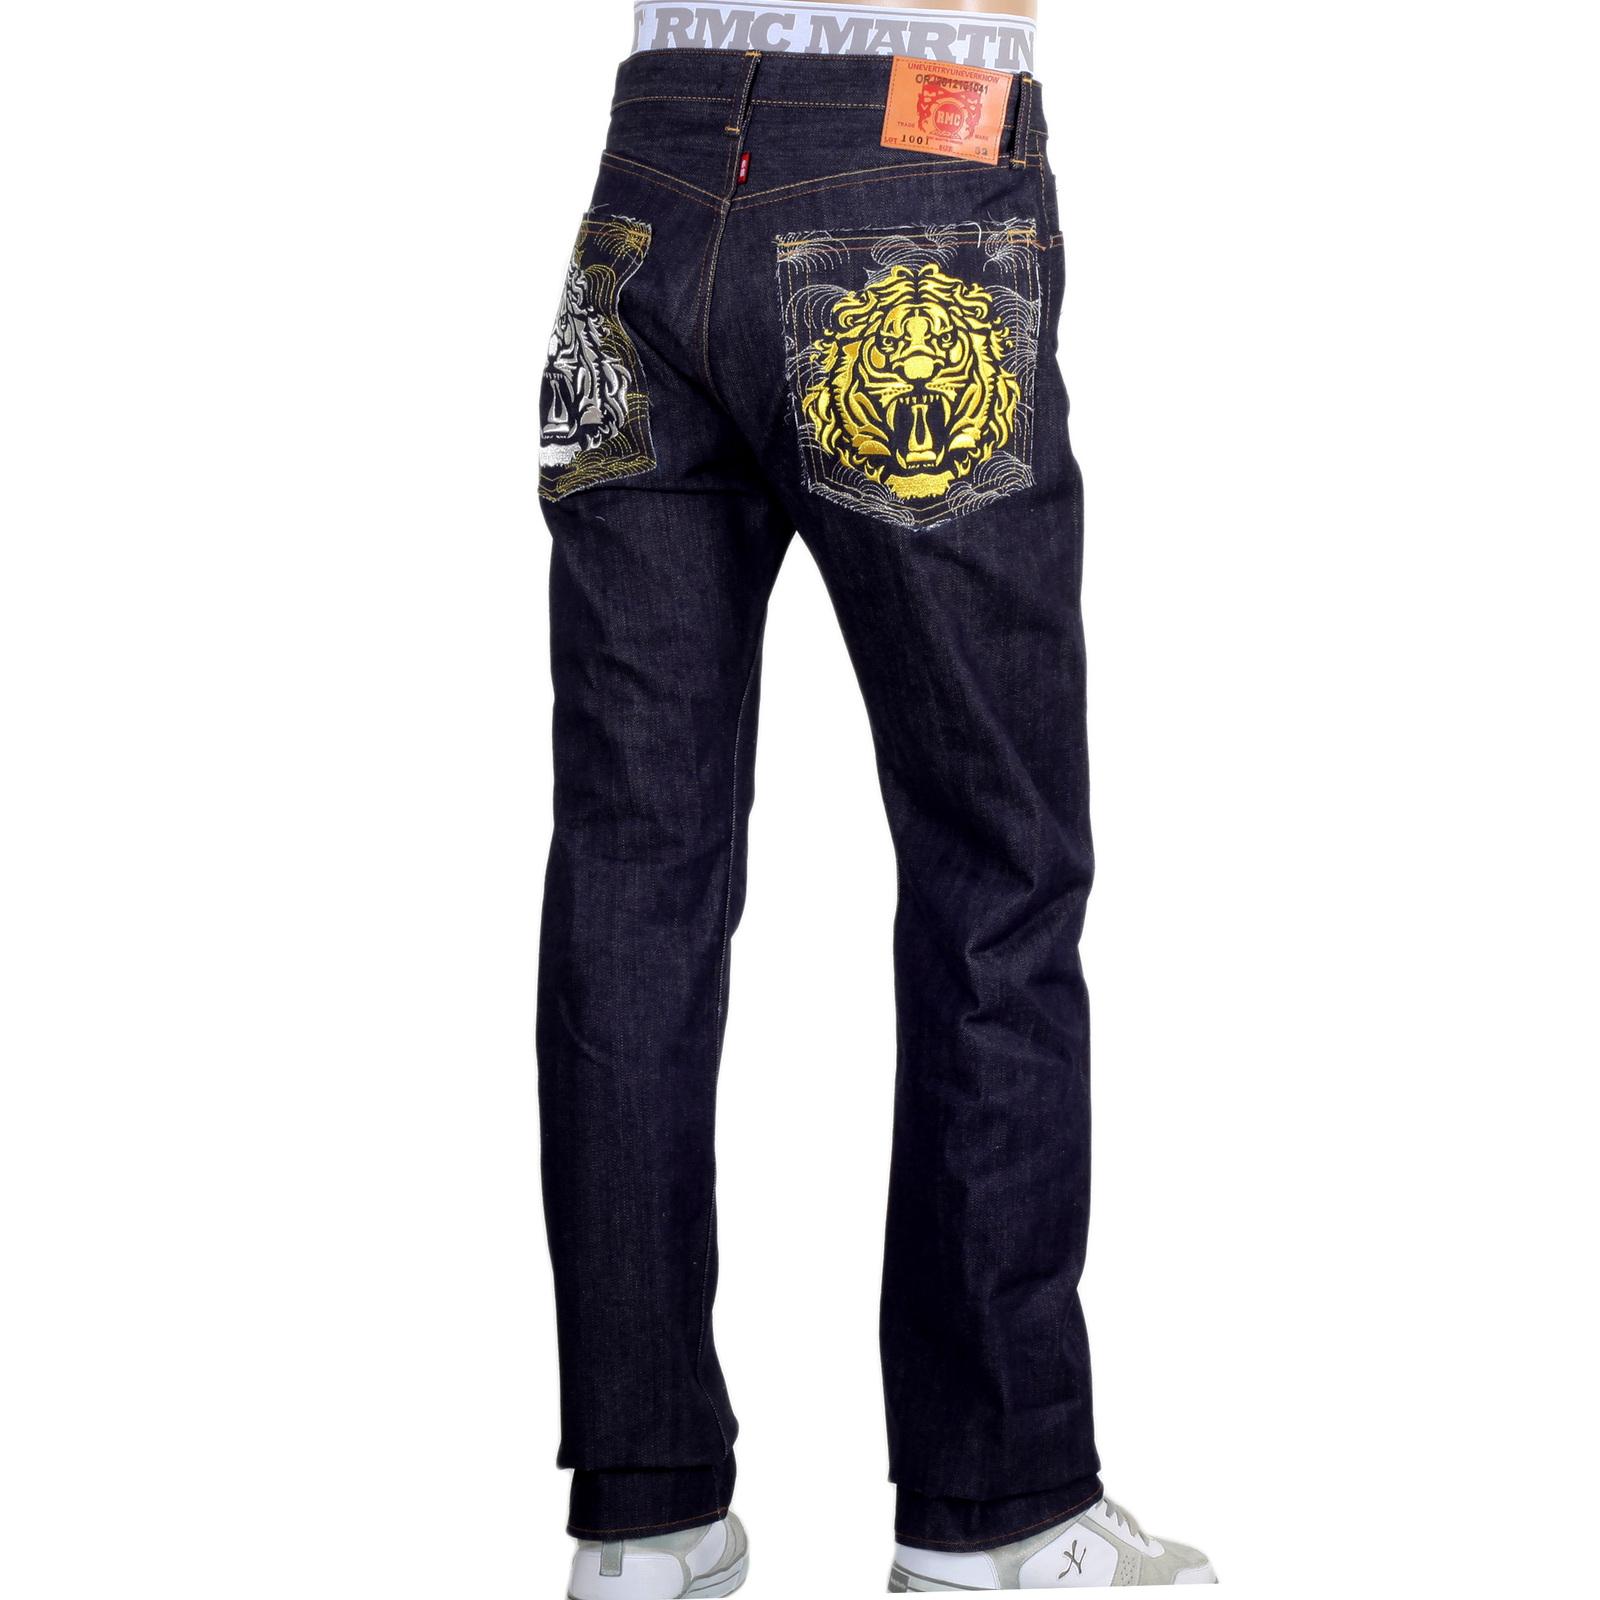 Jeans For Men Branded